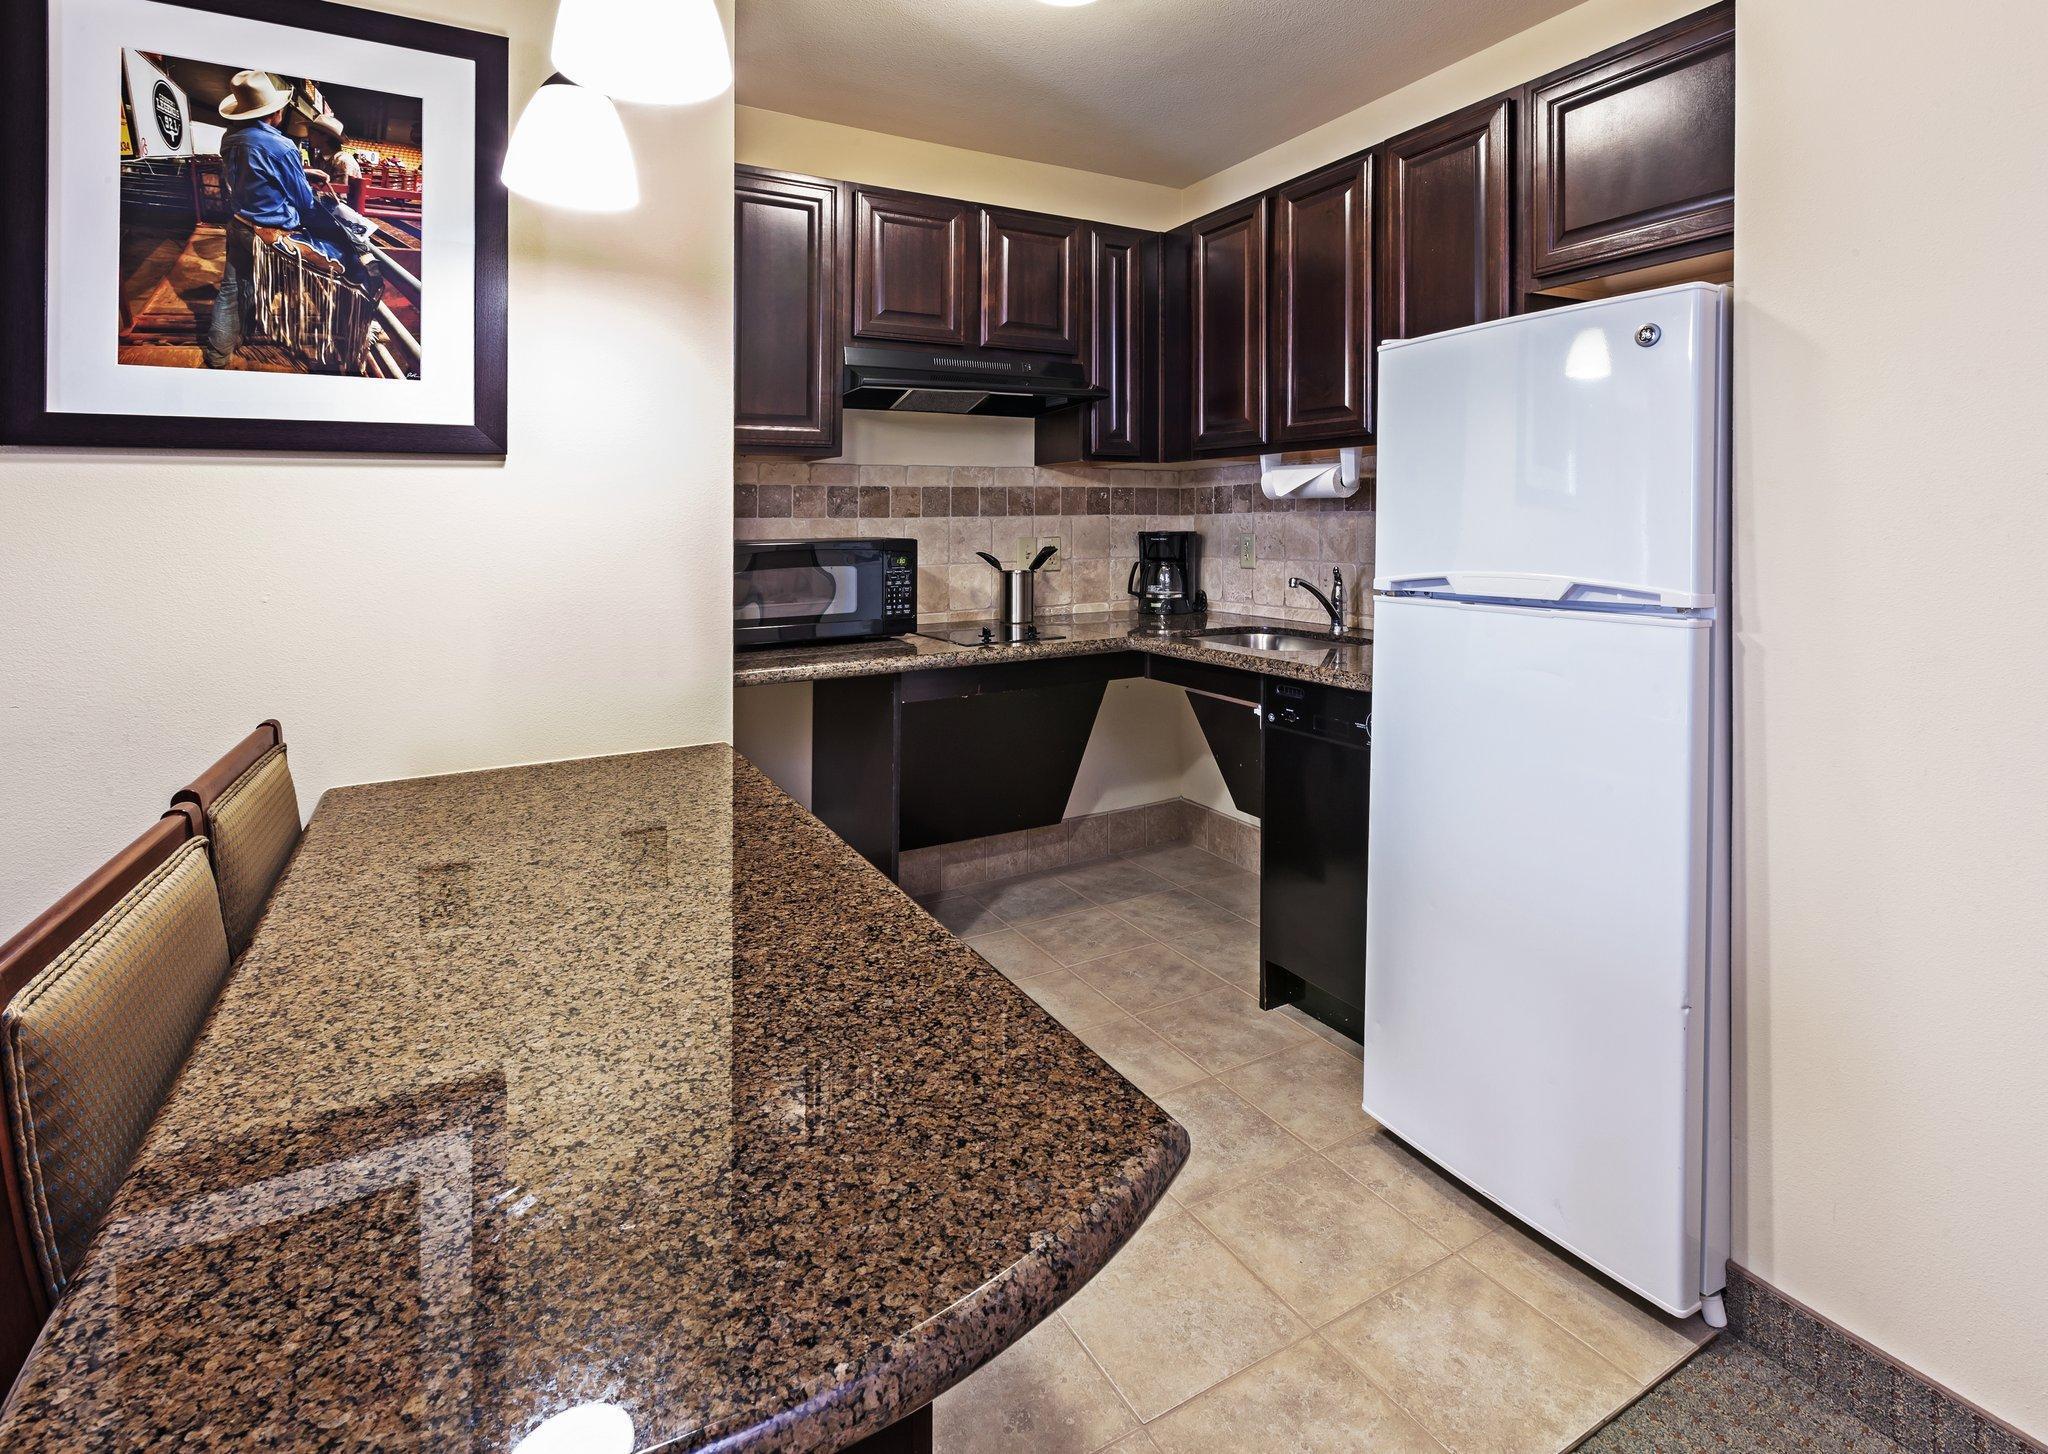 Staybridge Suites West Fort Worth